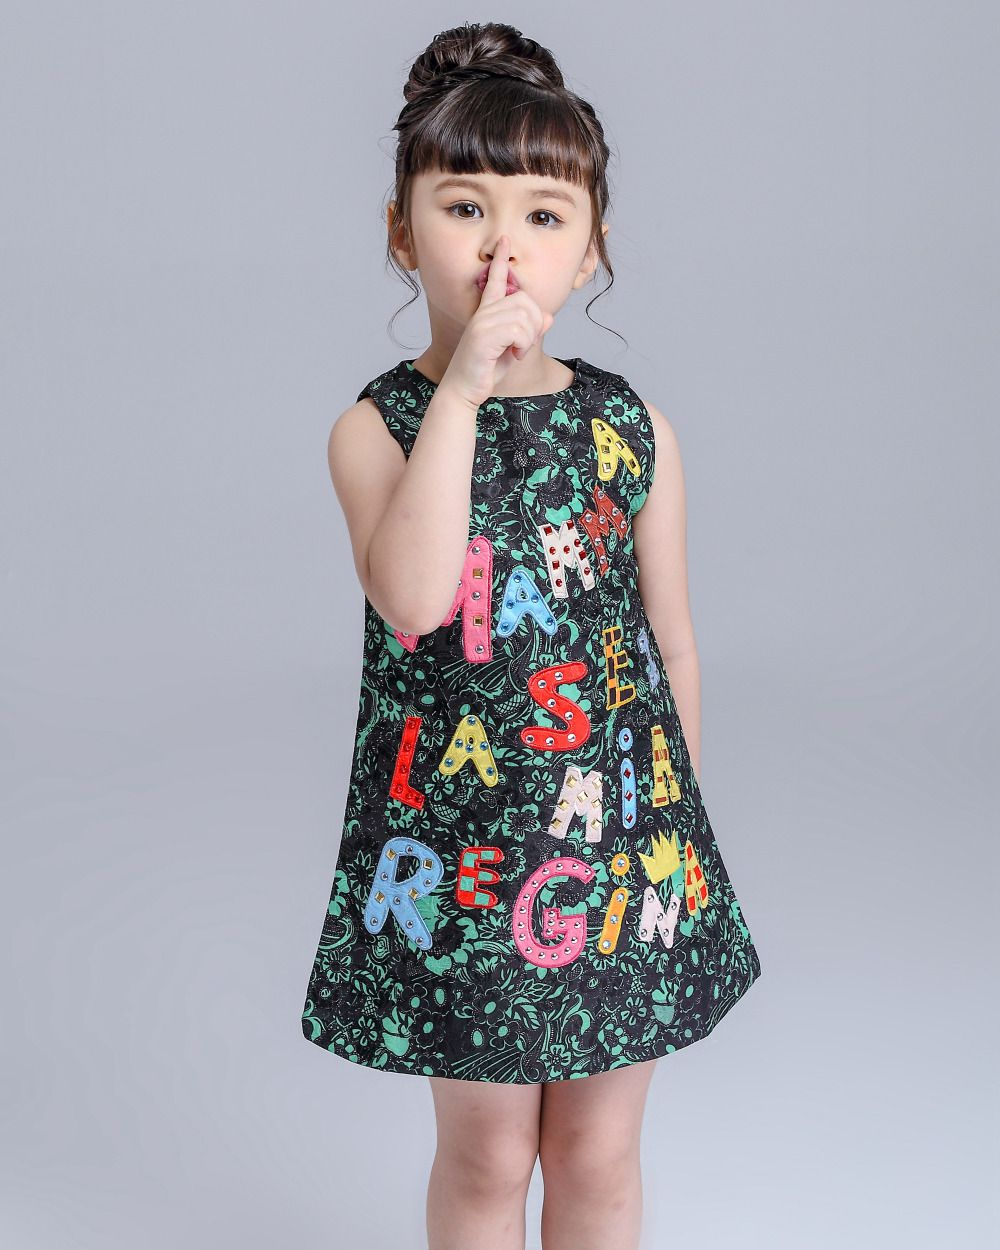 6bd8a046e3490 High End Luxury 2015 Autumn Girls Dress Brand Designer Kids Clothes Winter  Kids Clothes For Baby Girl Dress Princess Dress 3-10Y